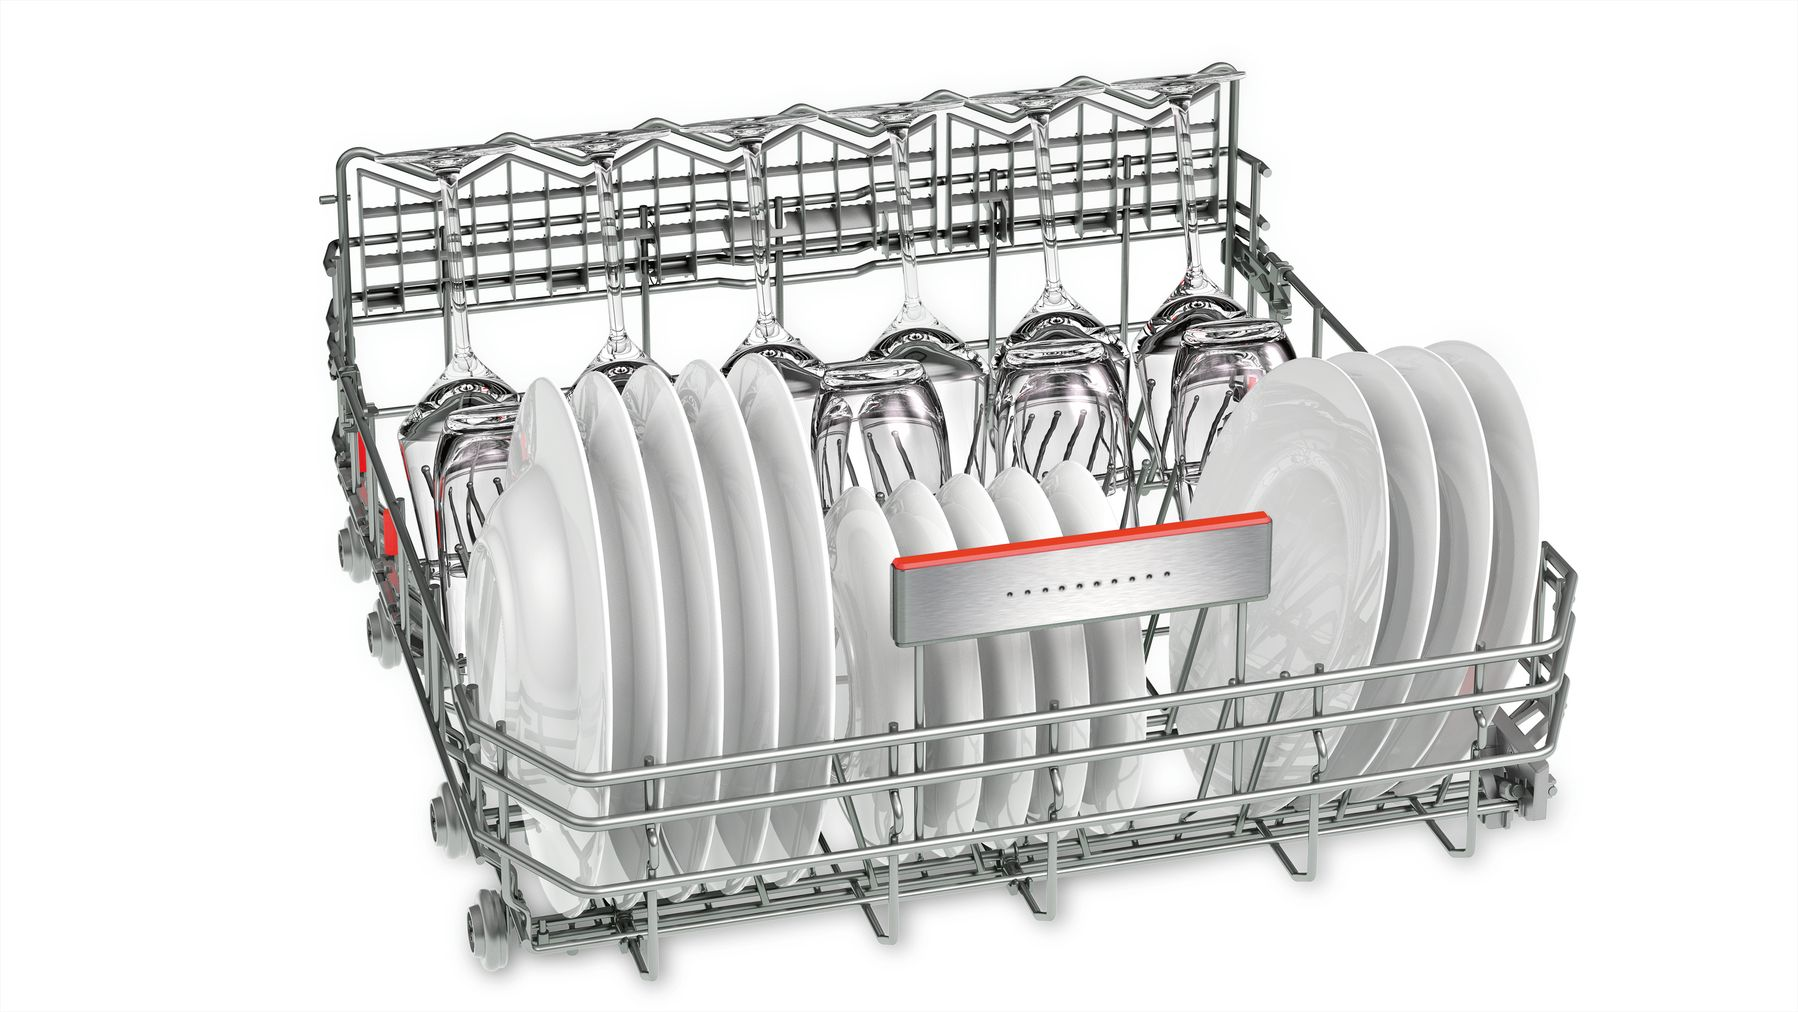 Máy rửa bát độc lập BOSCH SMS68TI03E|Serie 6